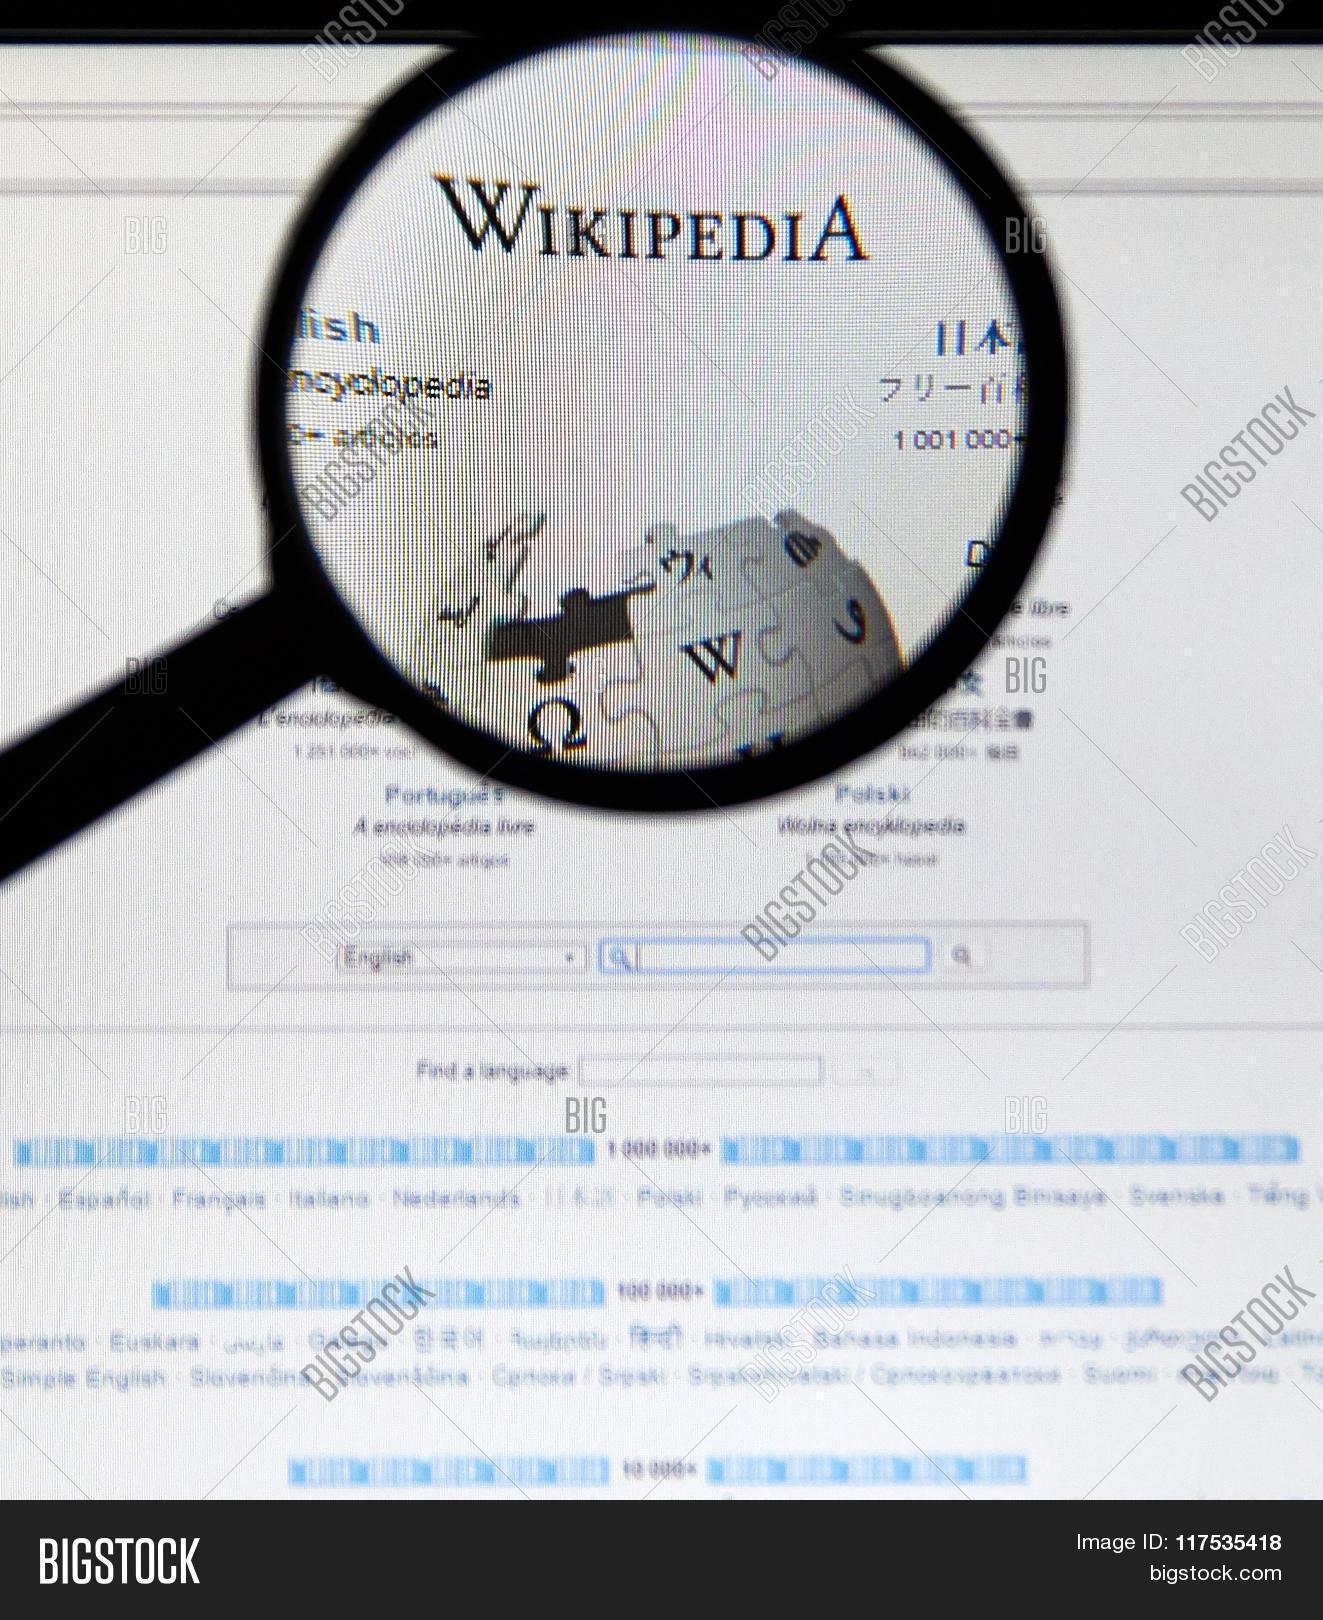 Wikipedia Home Page Image Photo Free Trial Bigstock